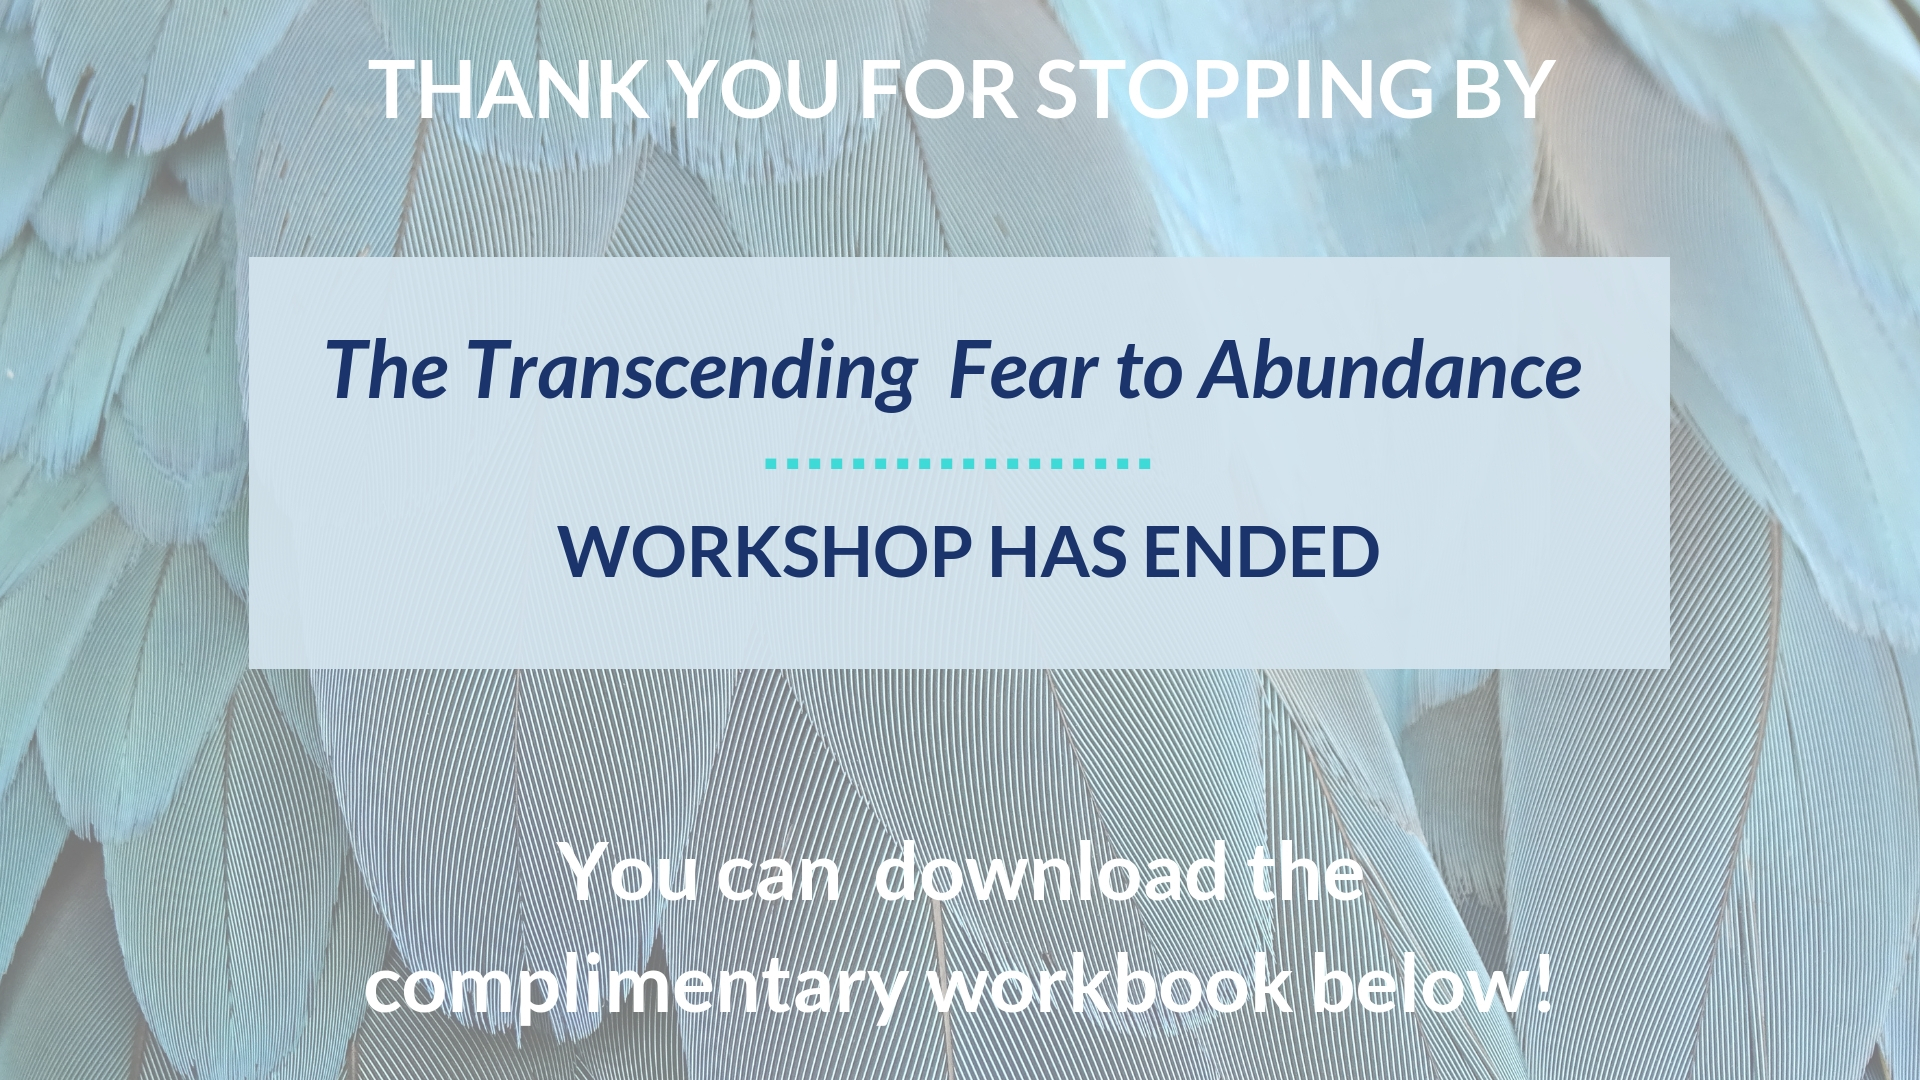 workshop has ended